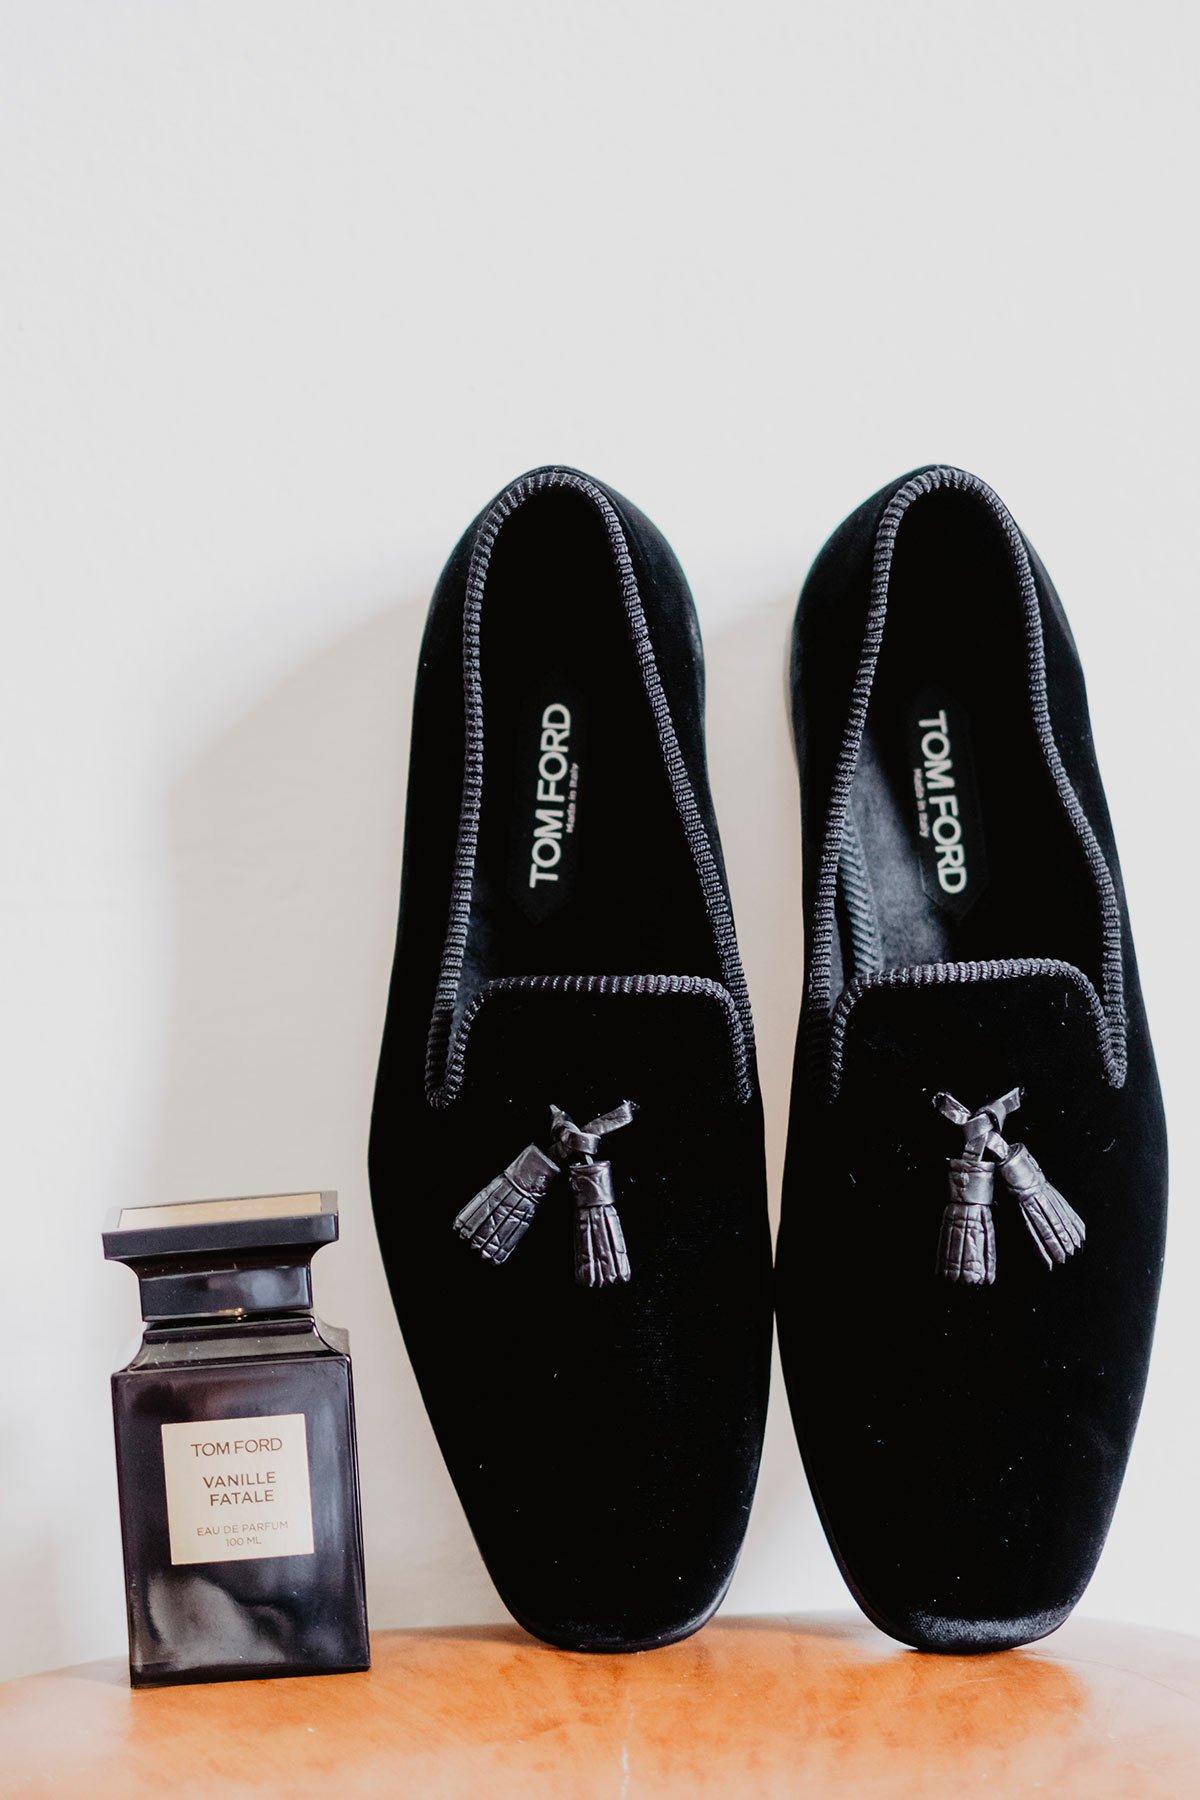 Ranya and Tarek, the groom shoes